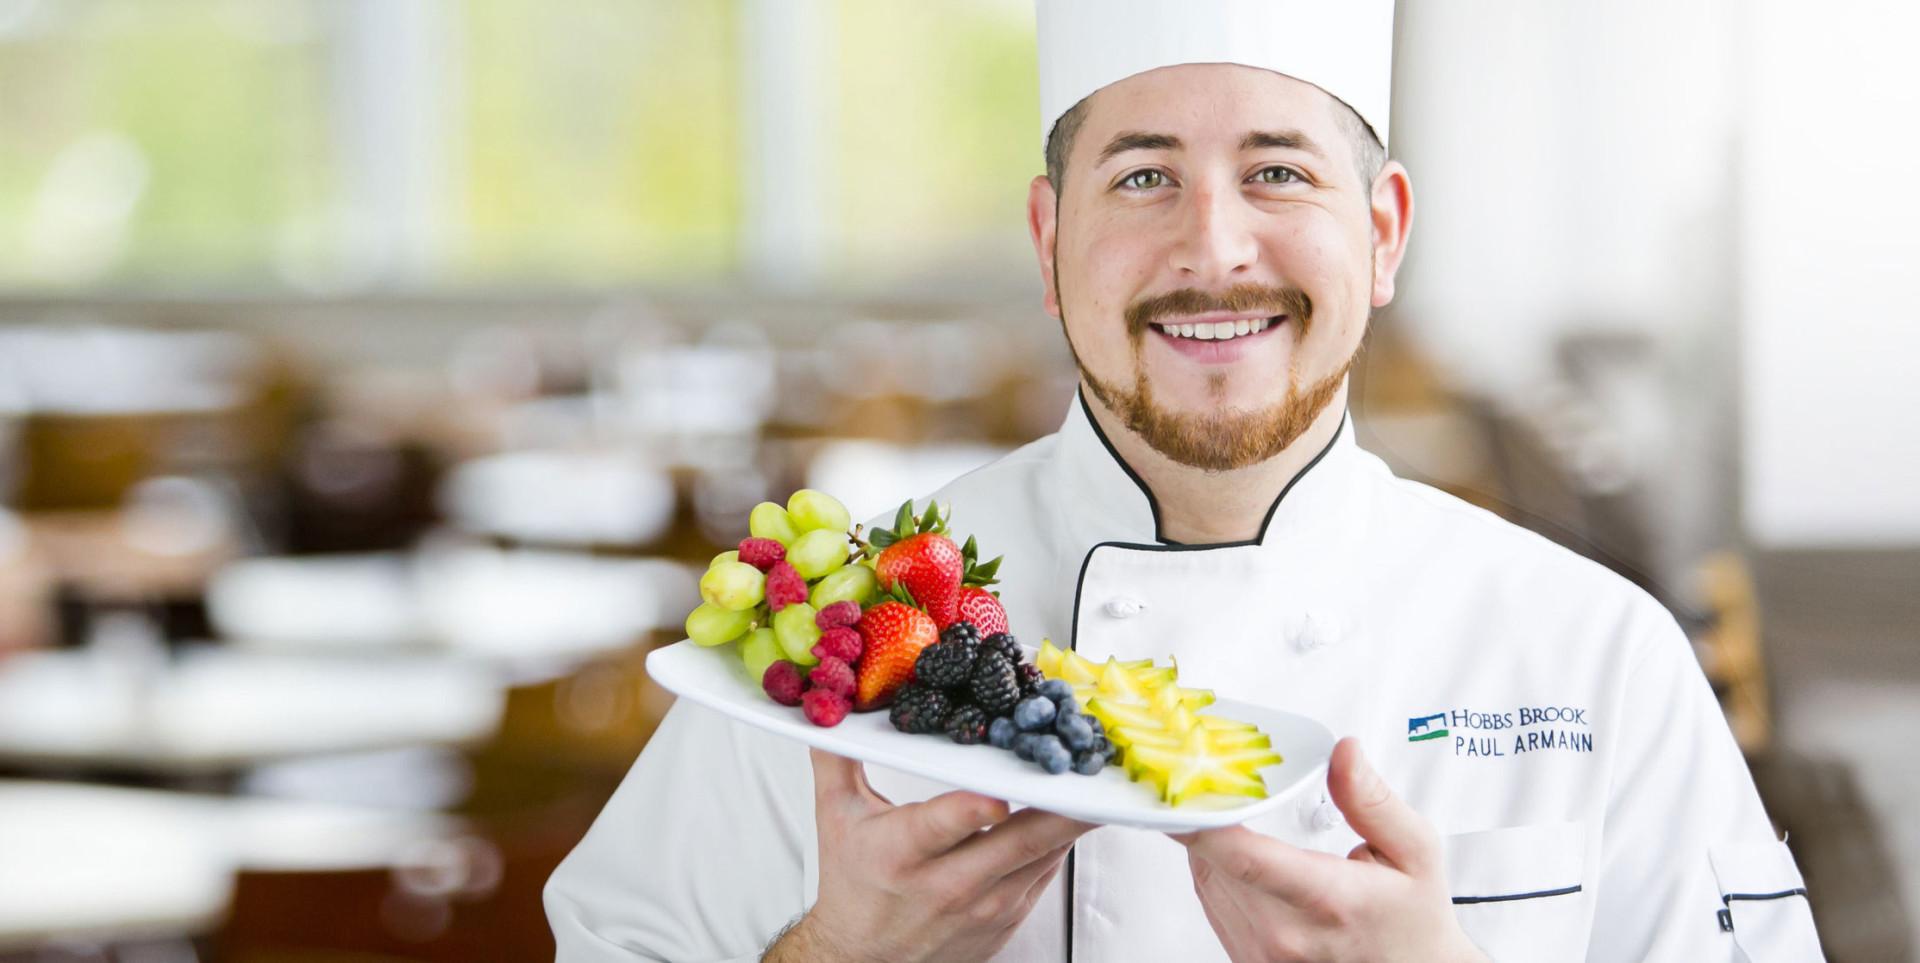 Dining – Meet Paul